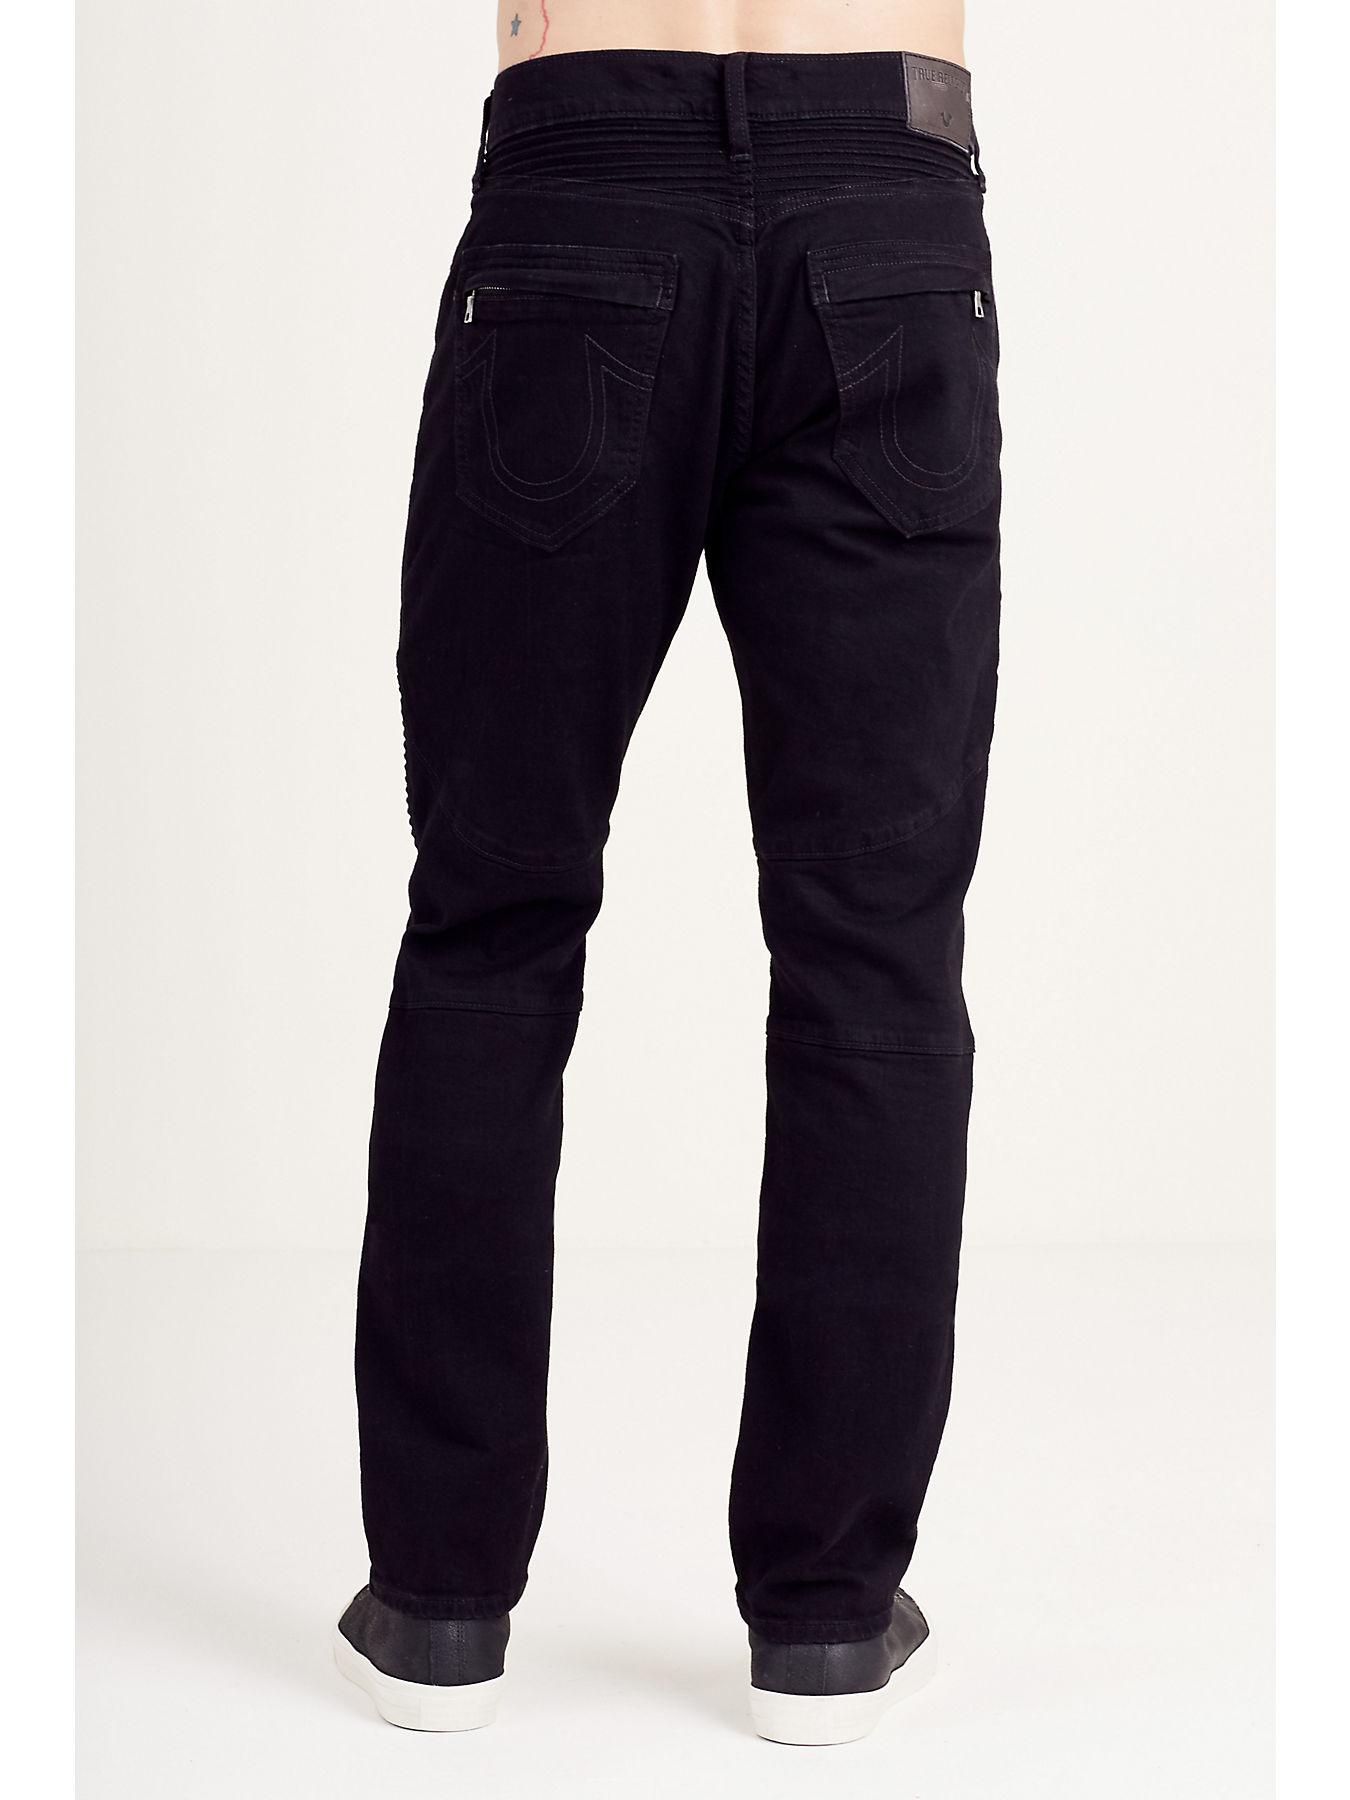 true religion rocco jeans mens